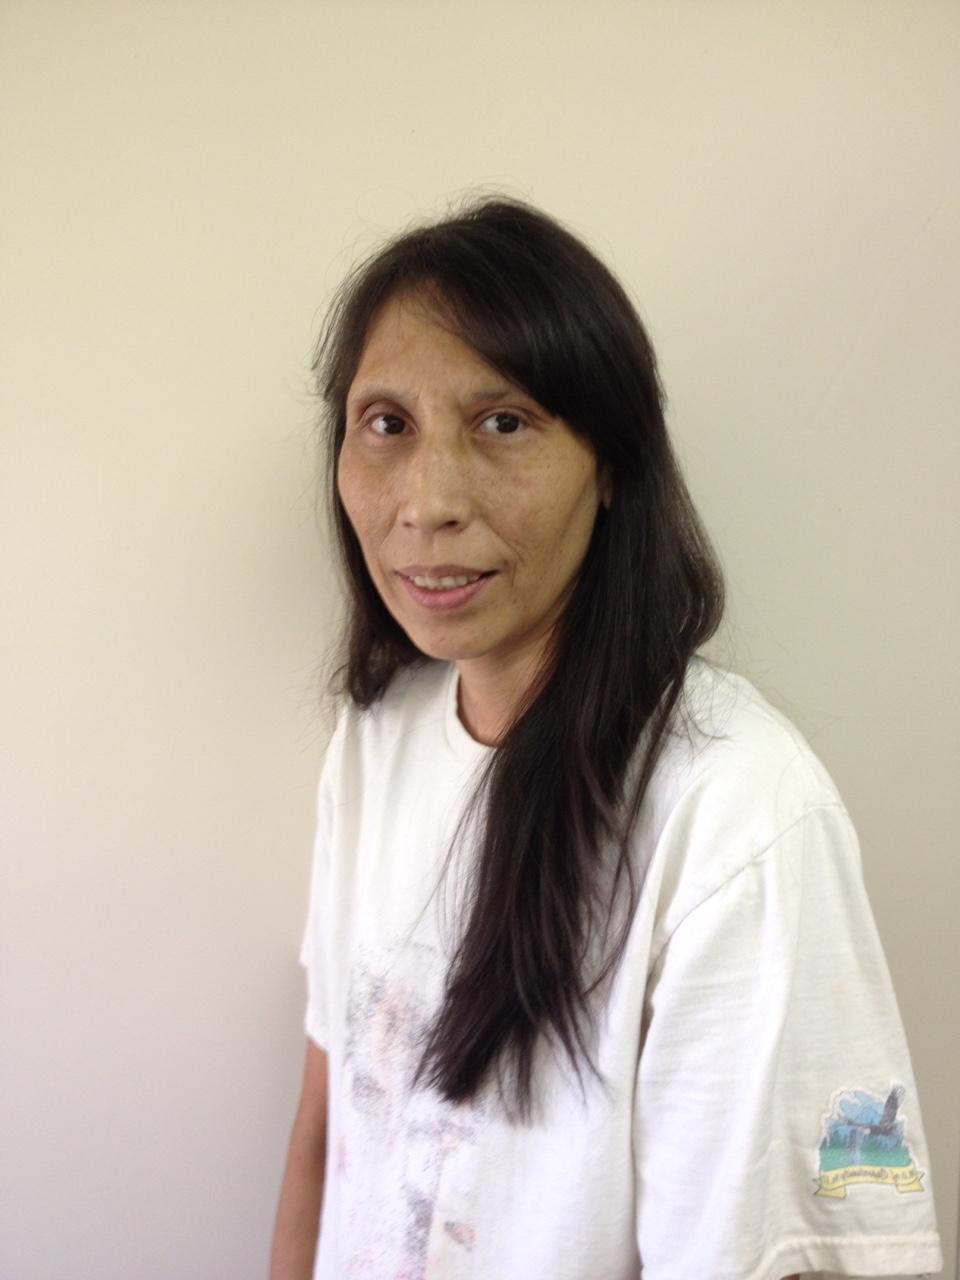 Esther cardinal -employee for the Homemaker program for elders and disabled